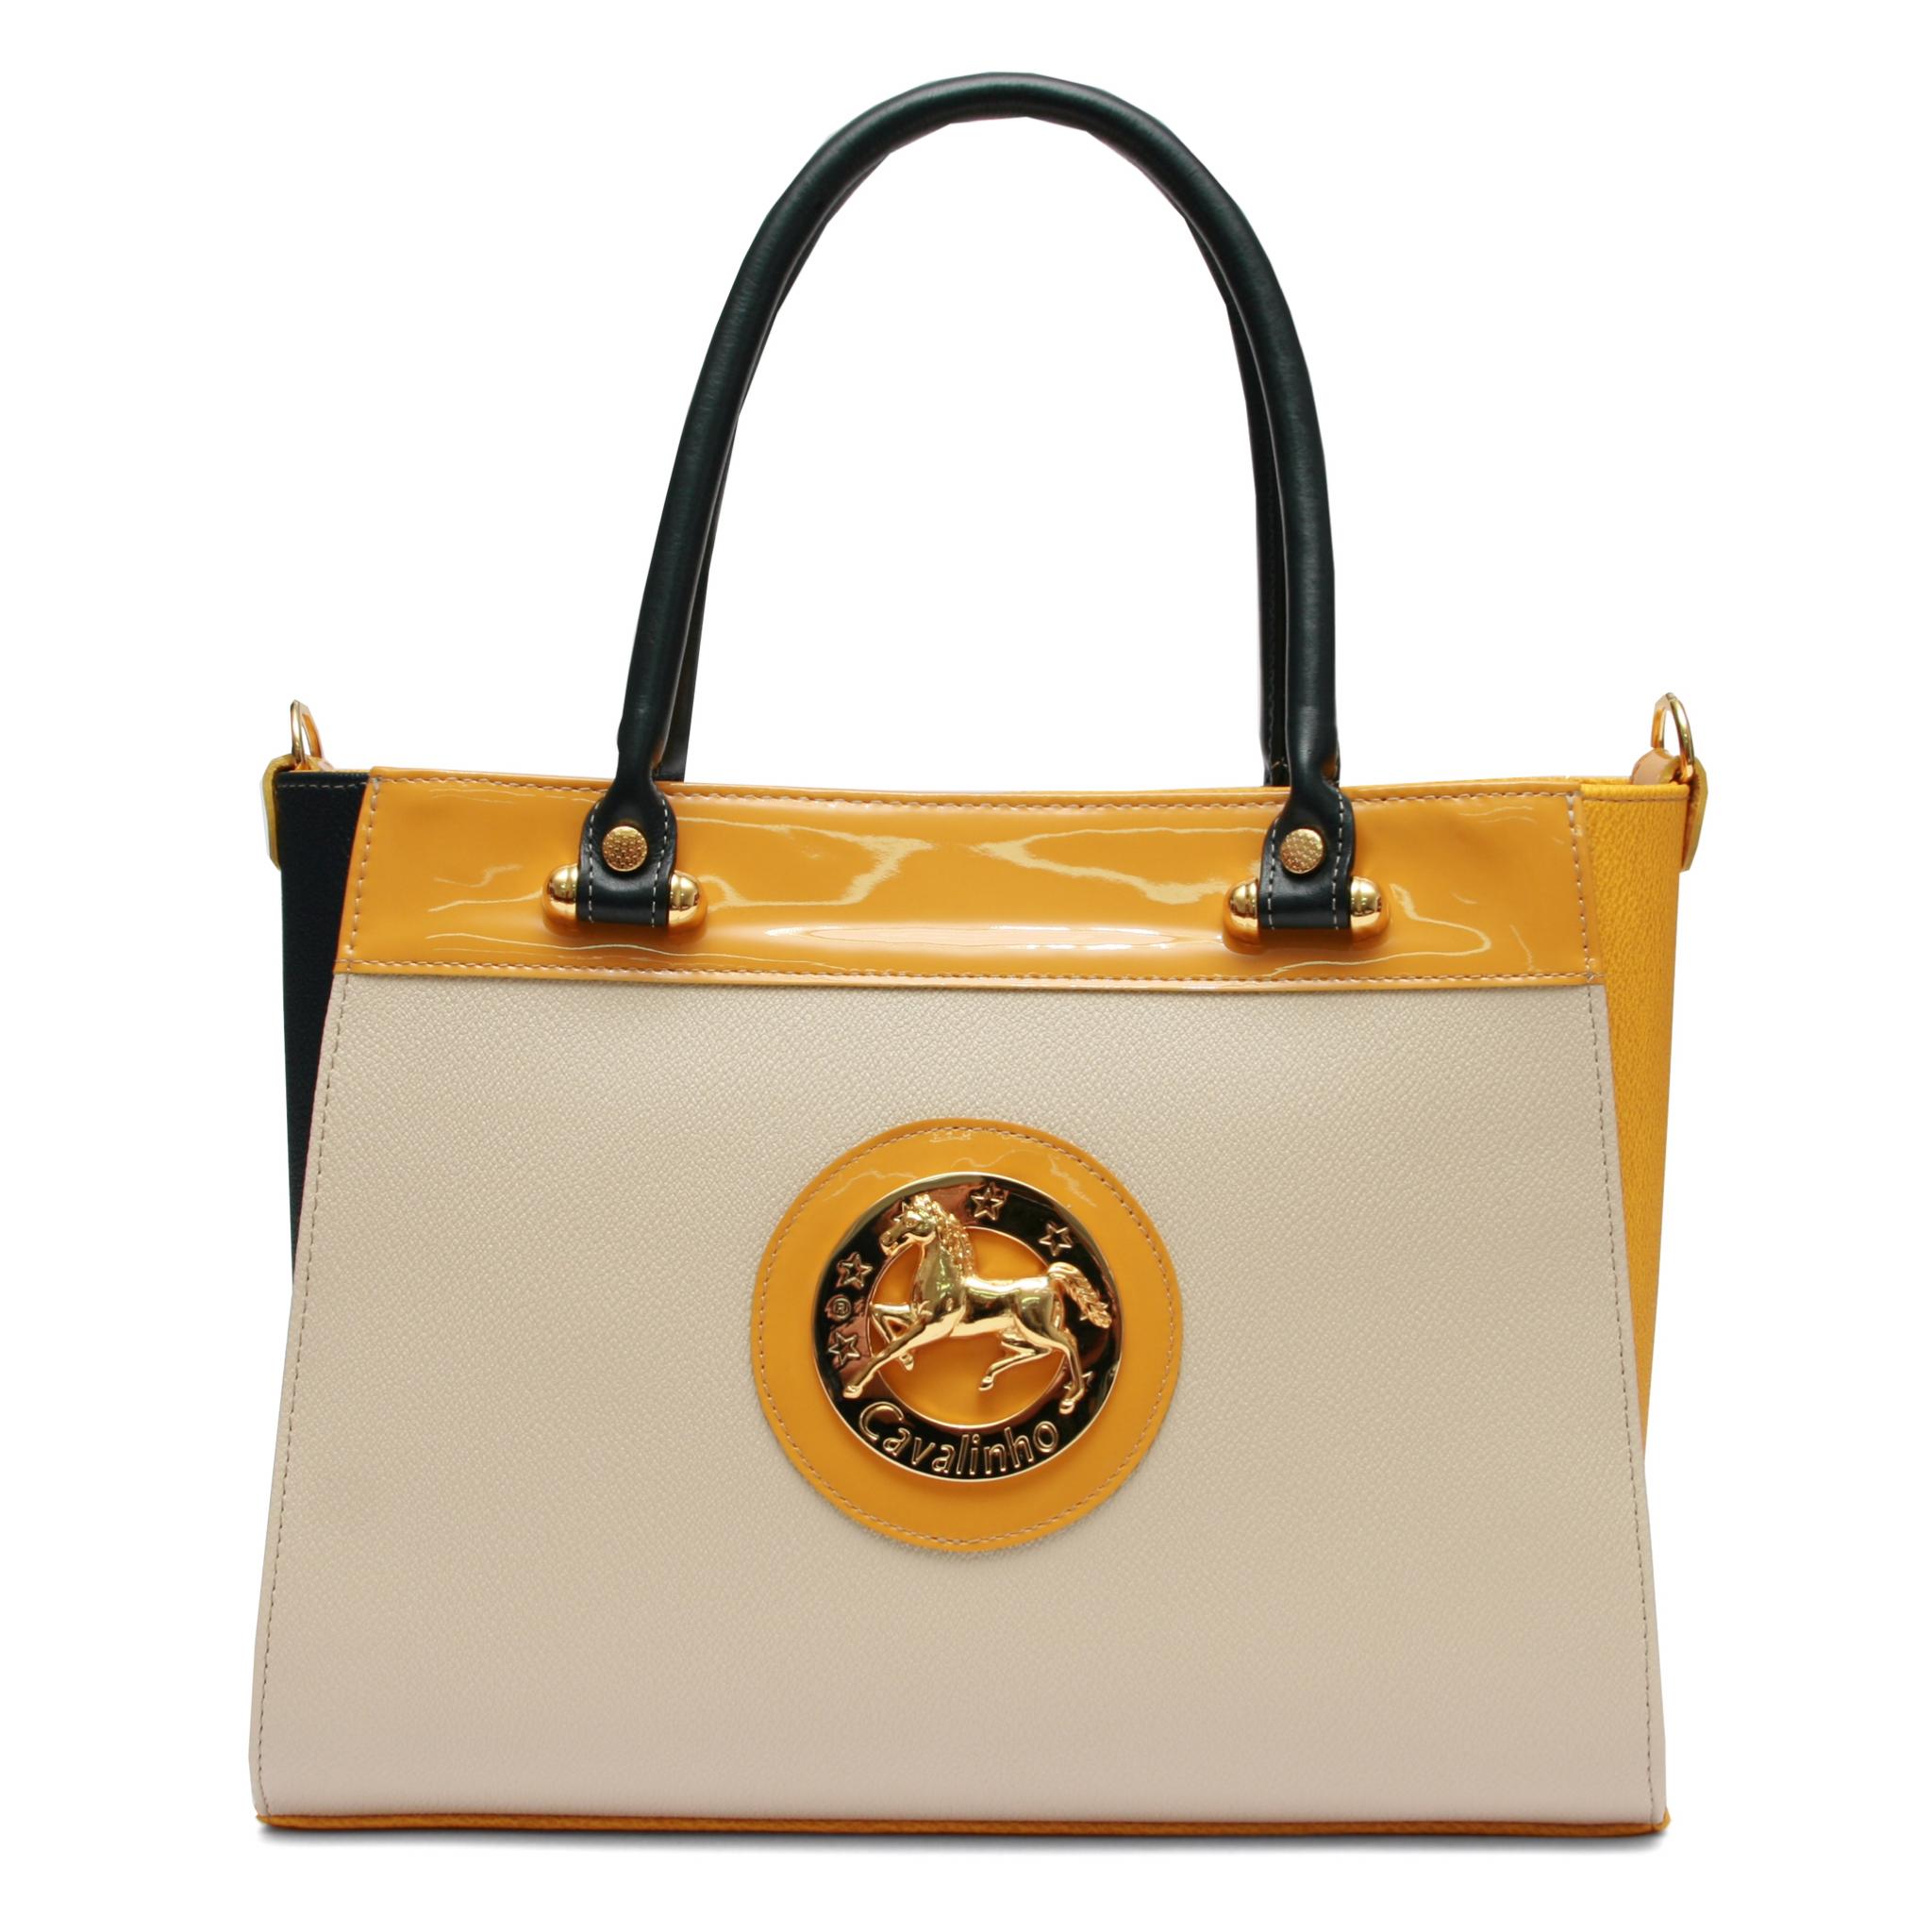 Tote Bag - Every Woman by VIDA VIDA eMFtUySX4